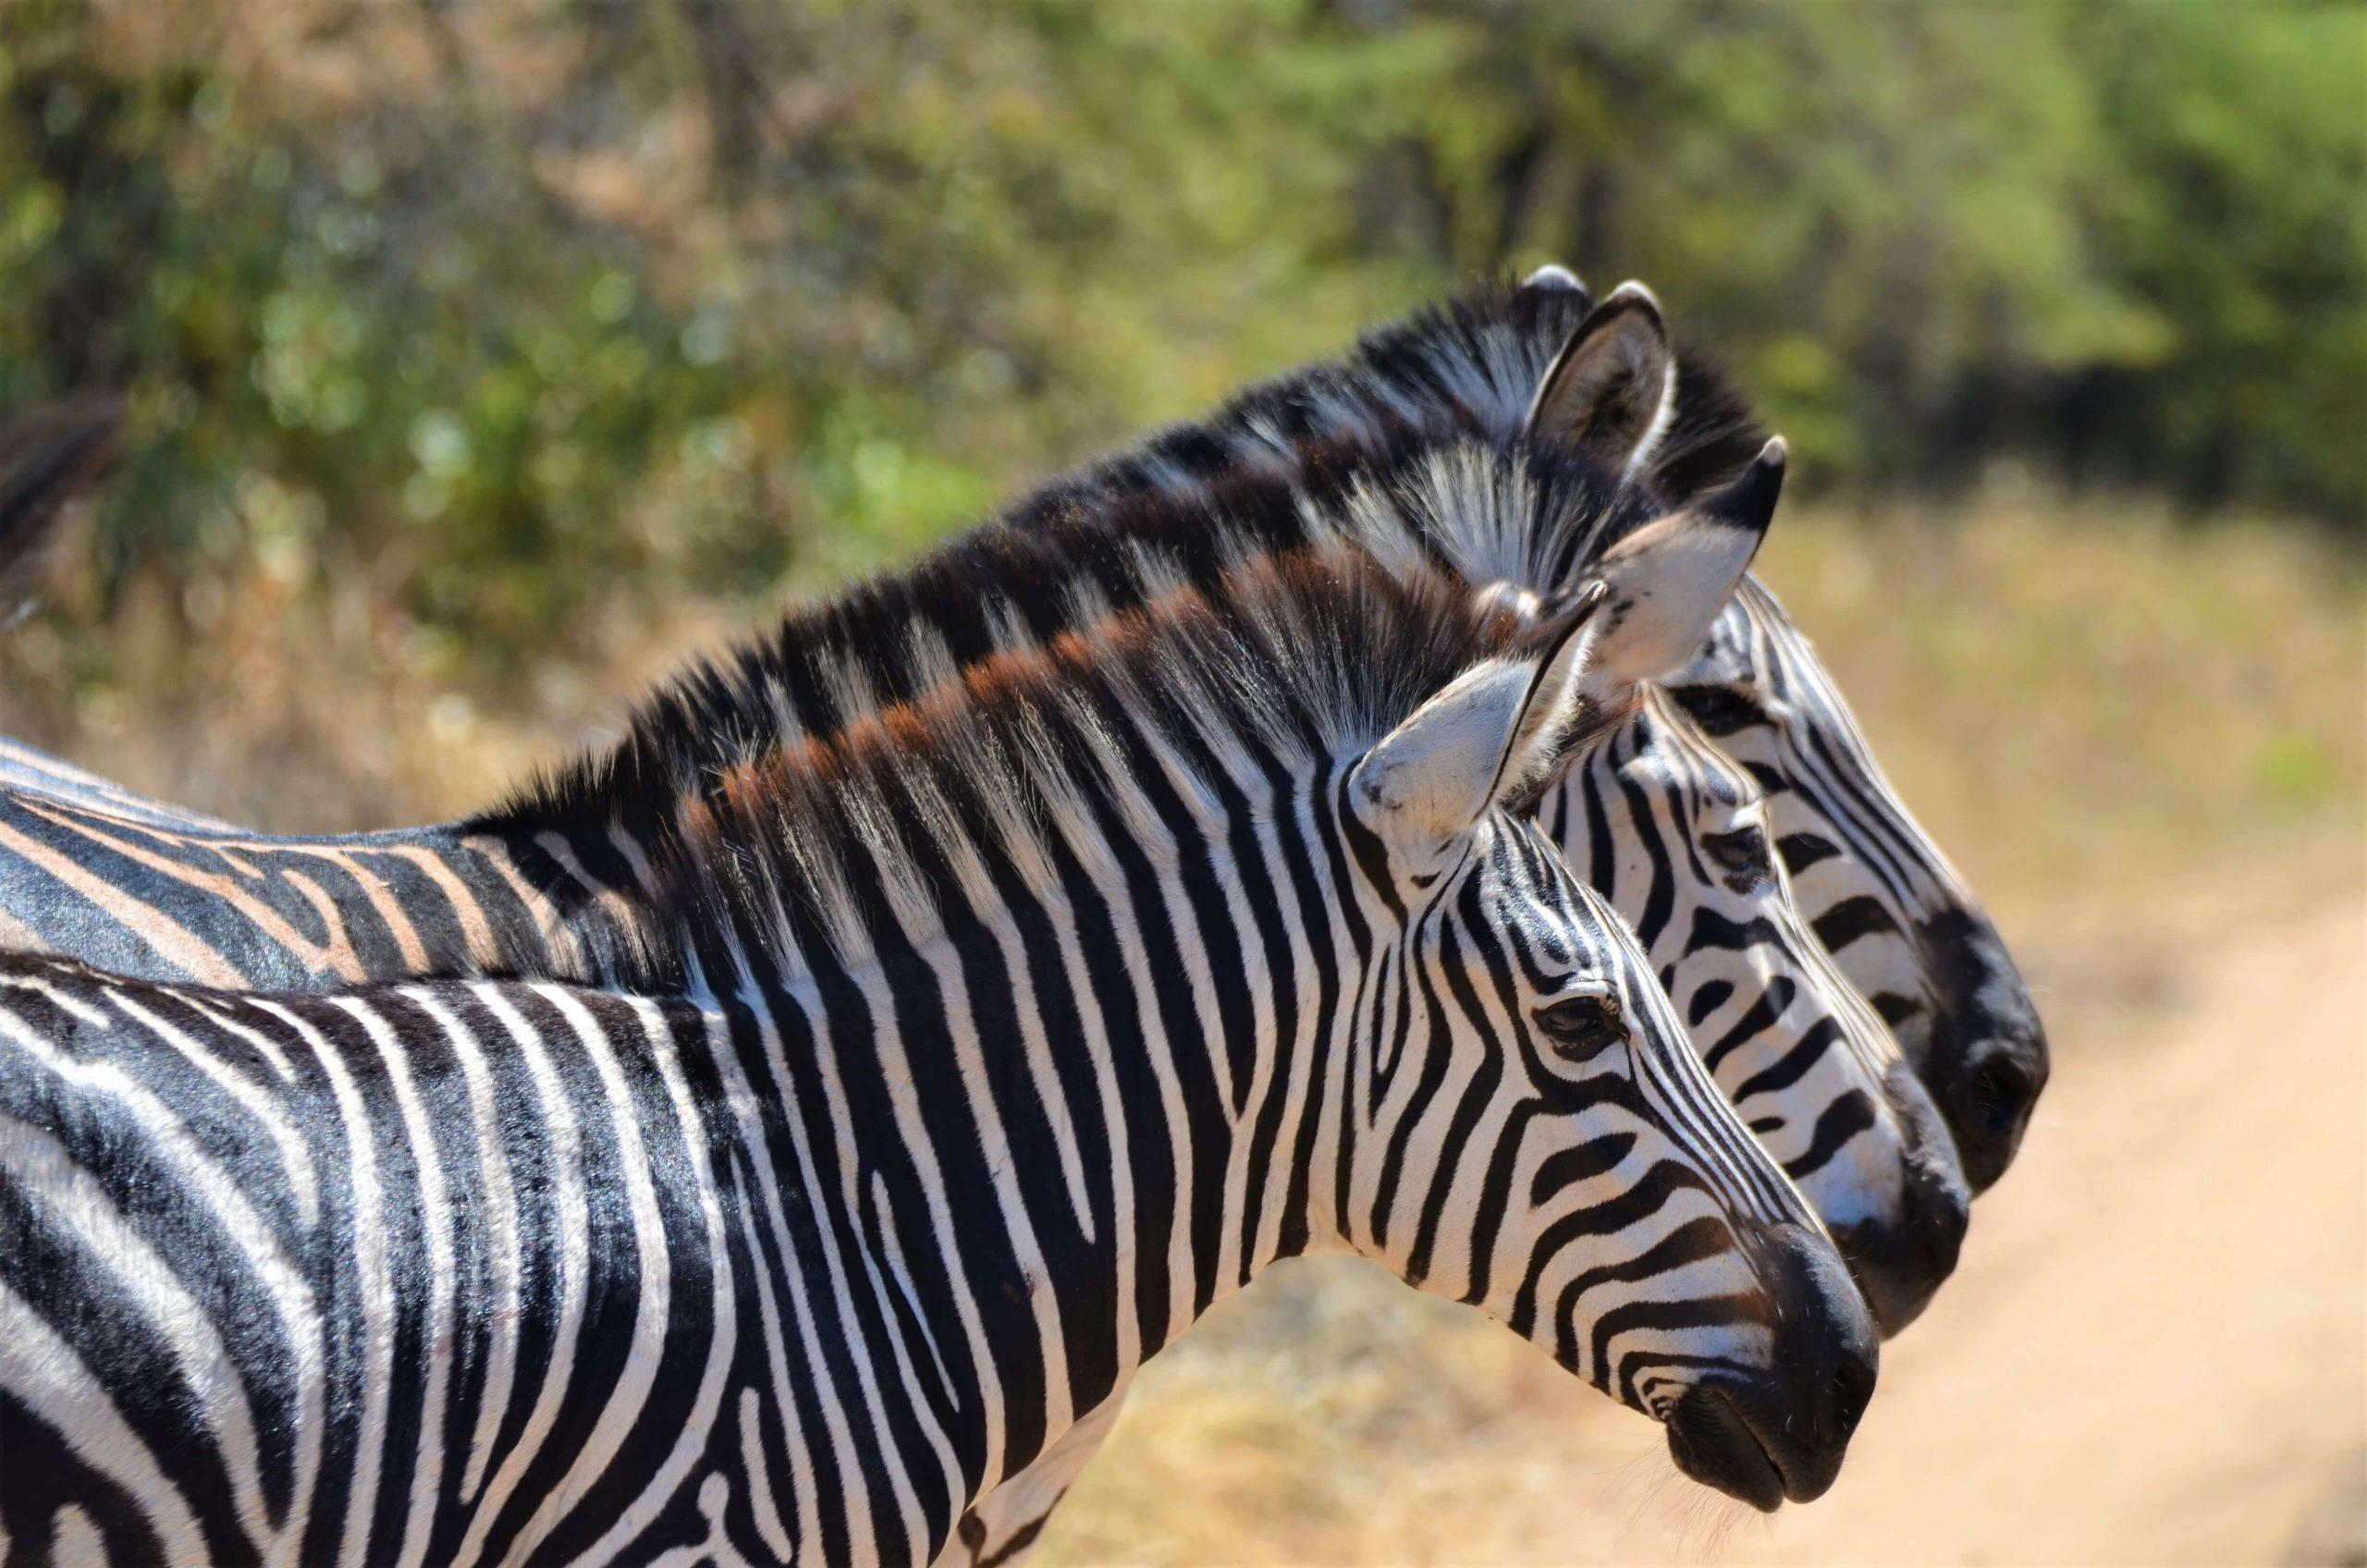 Zebras on safari in Malawi